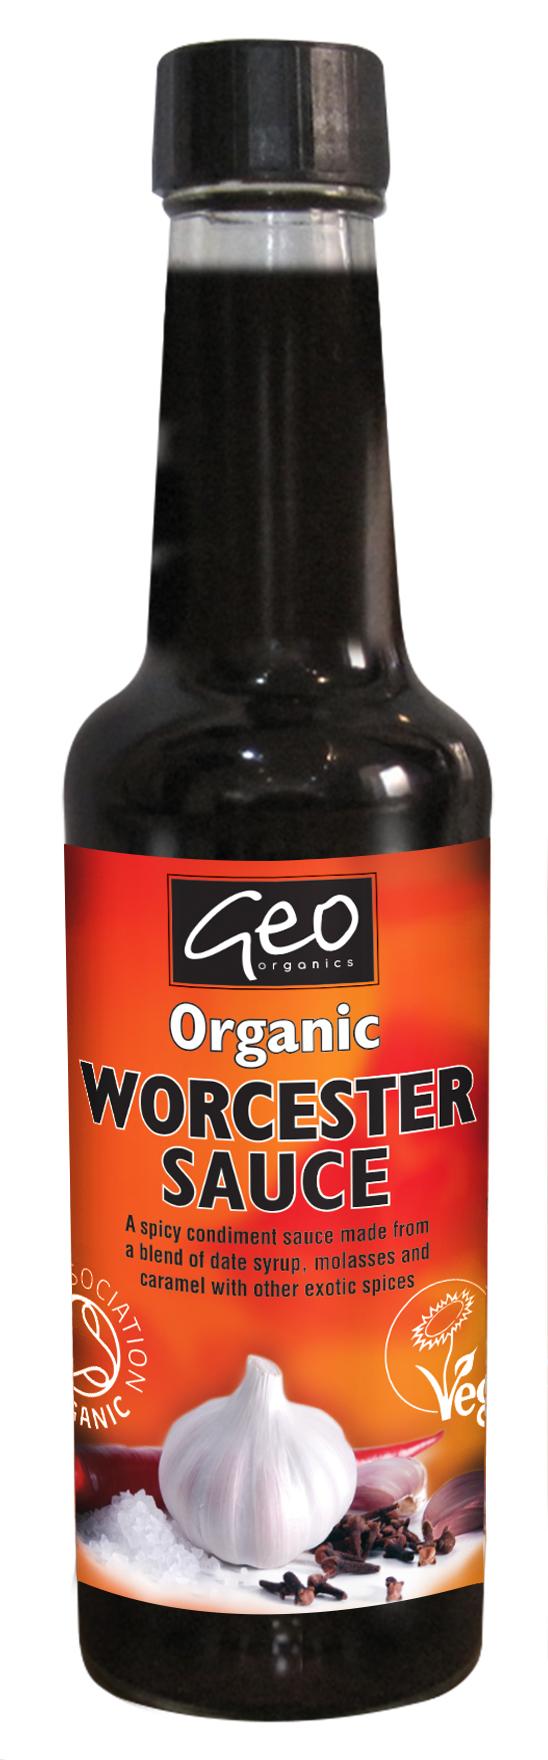 worcester_sauce